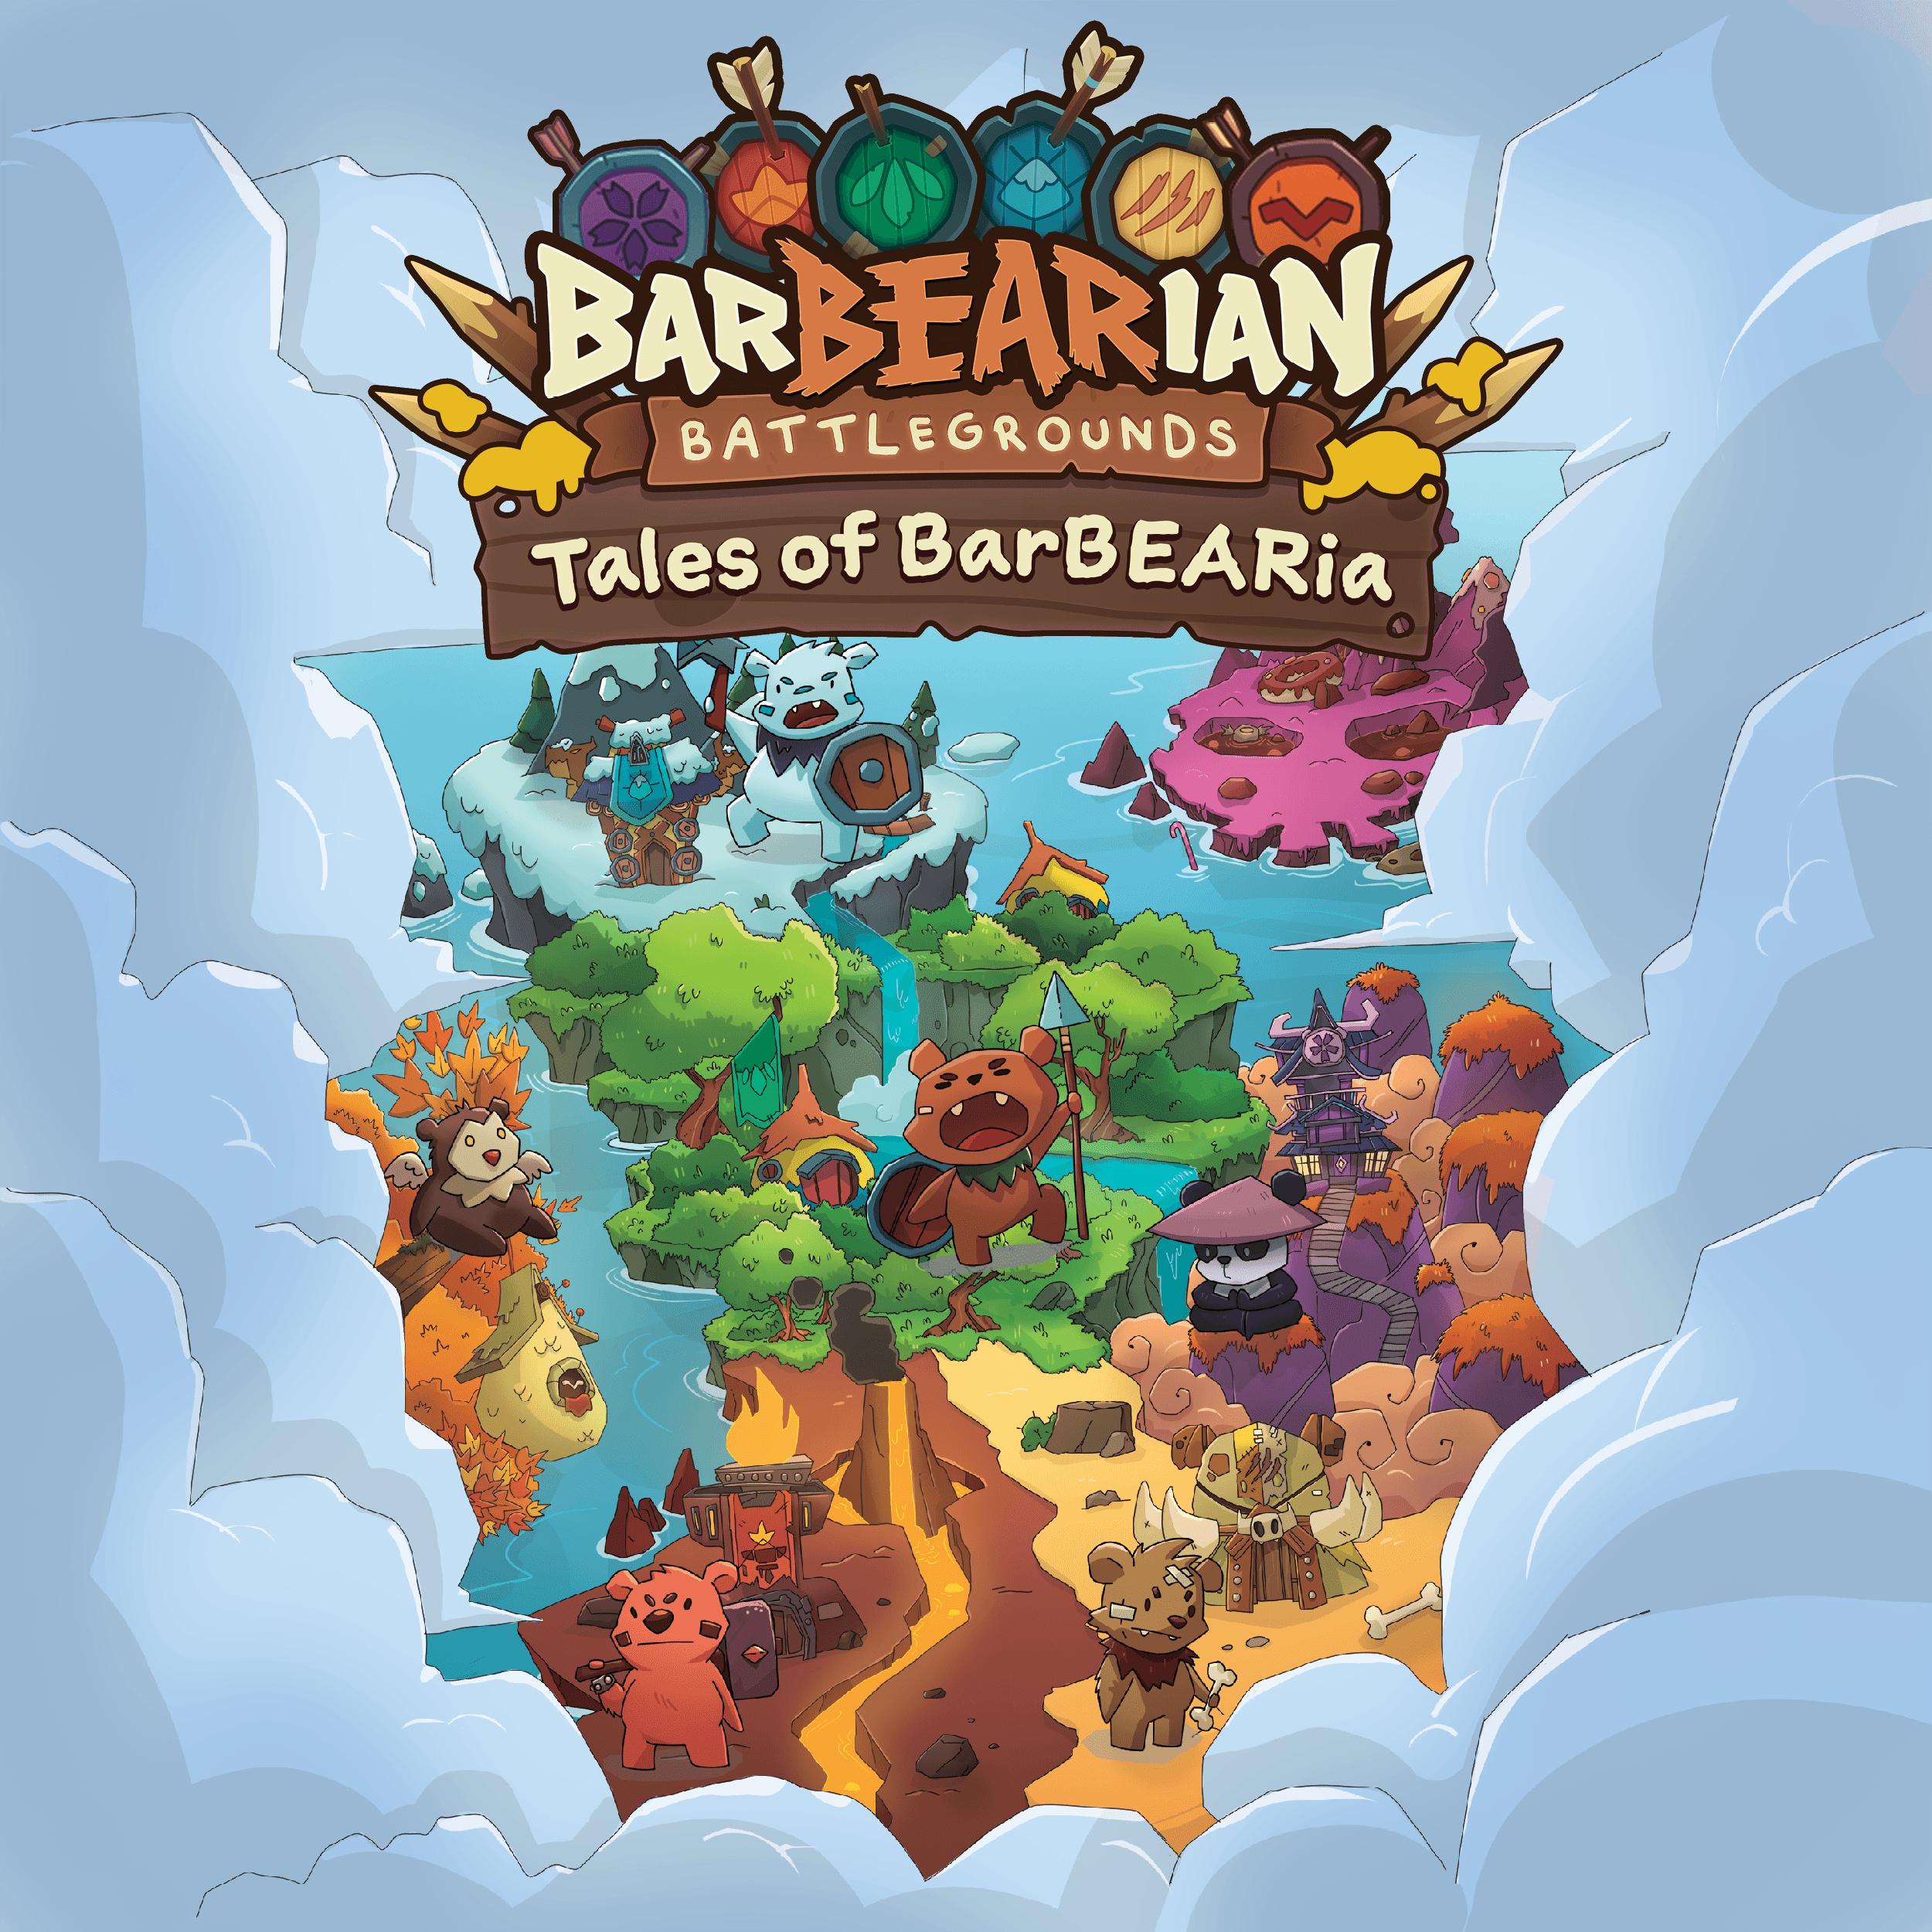 Tales of BarBEARia